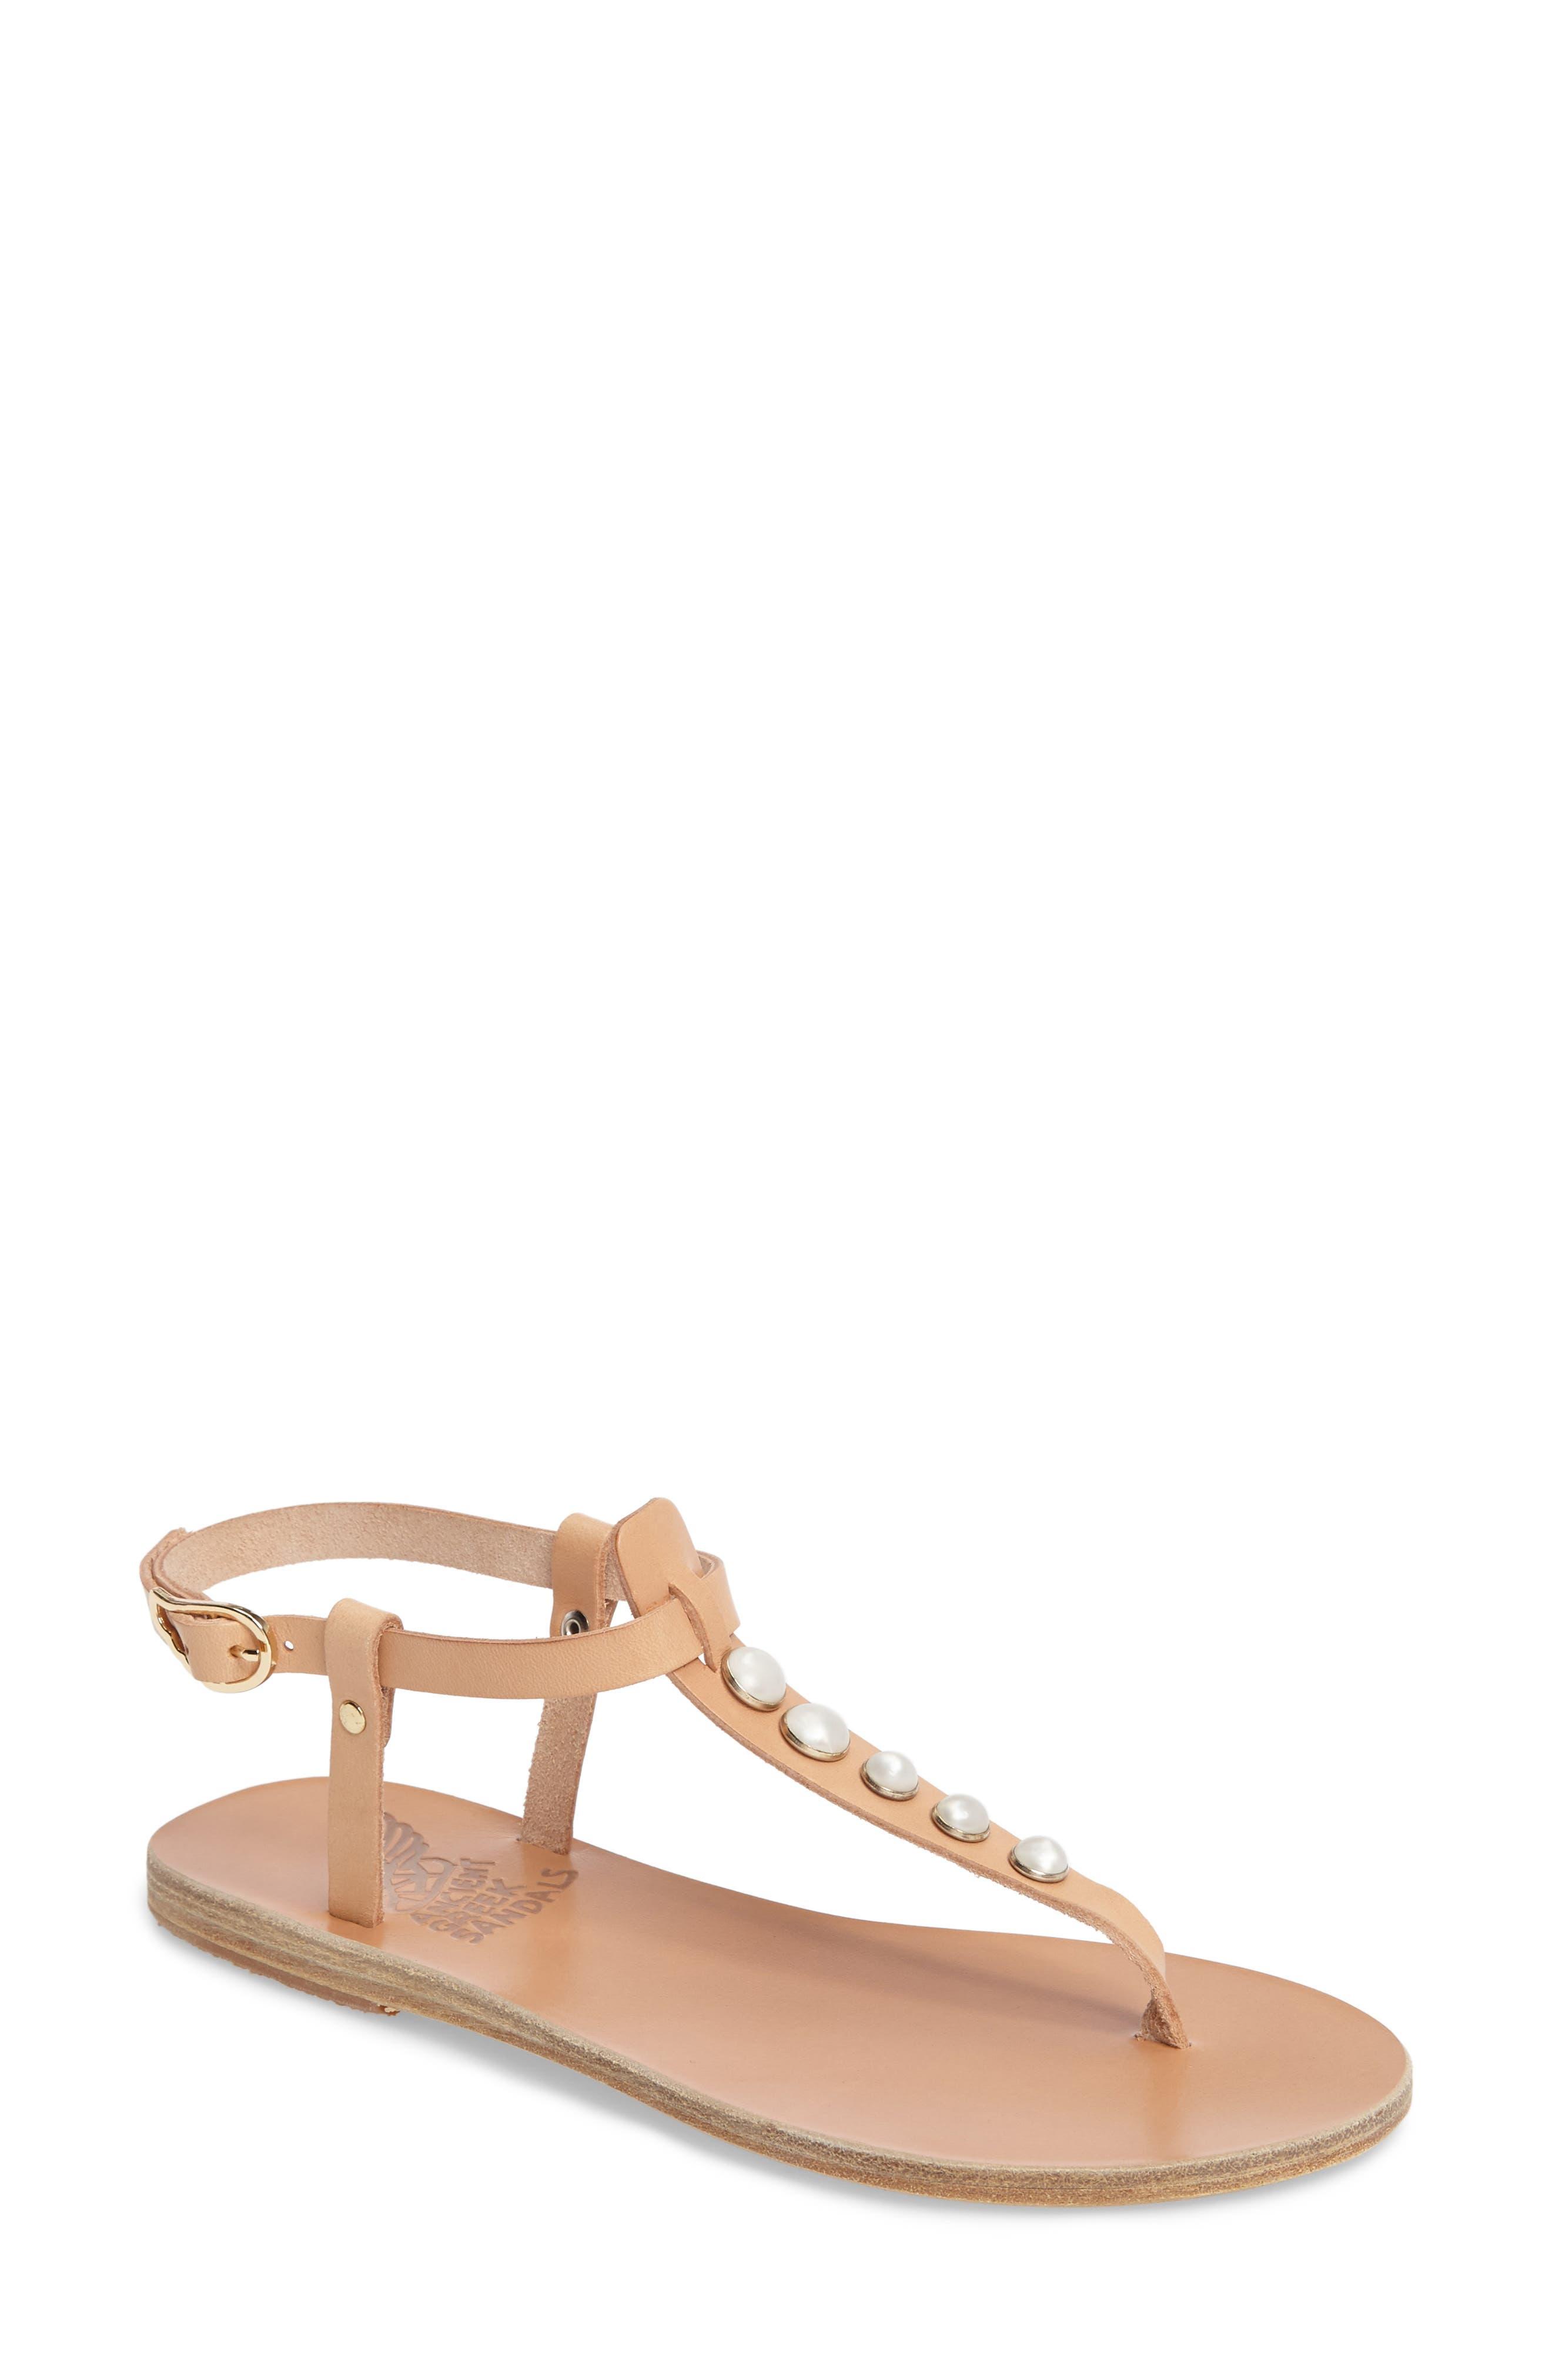 Lito Imitation Pearl Embellished T-Strap Sandal,                         Main,                         color, Natural Vachetta